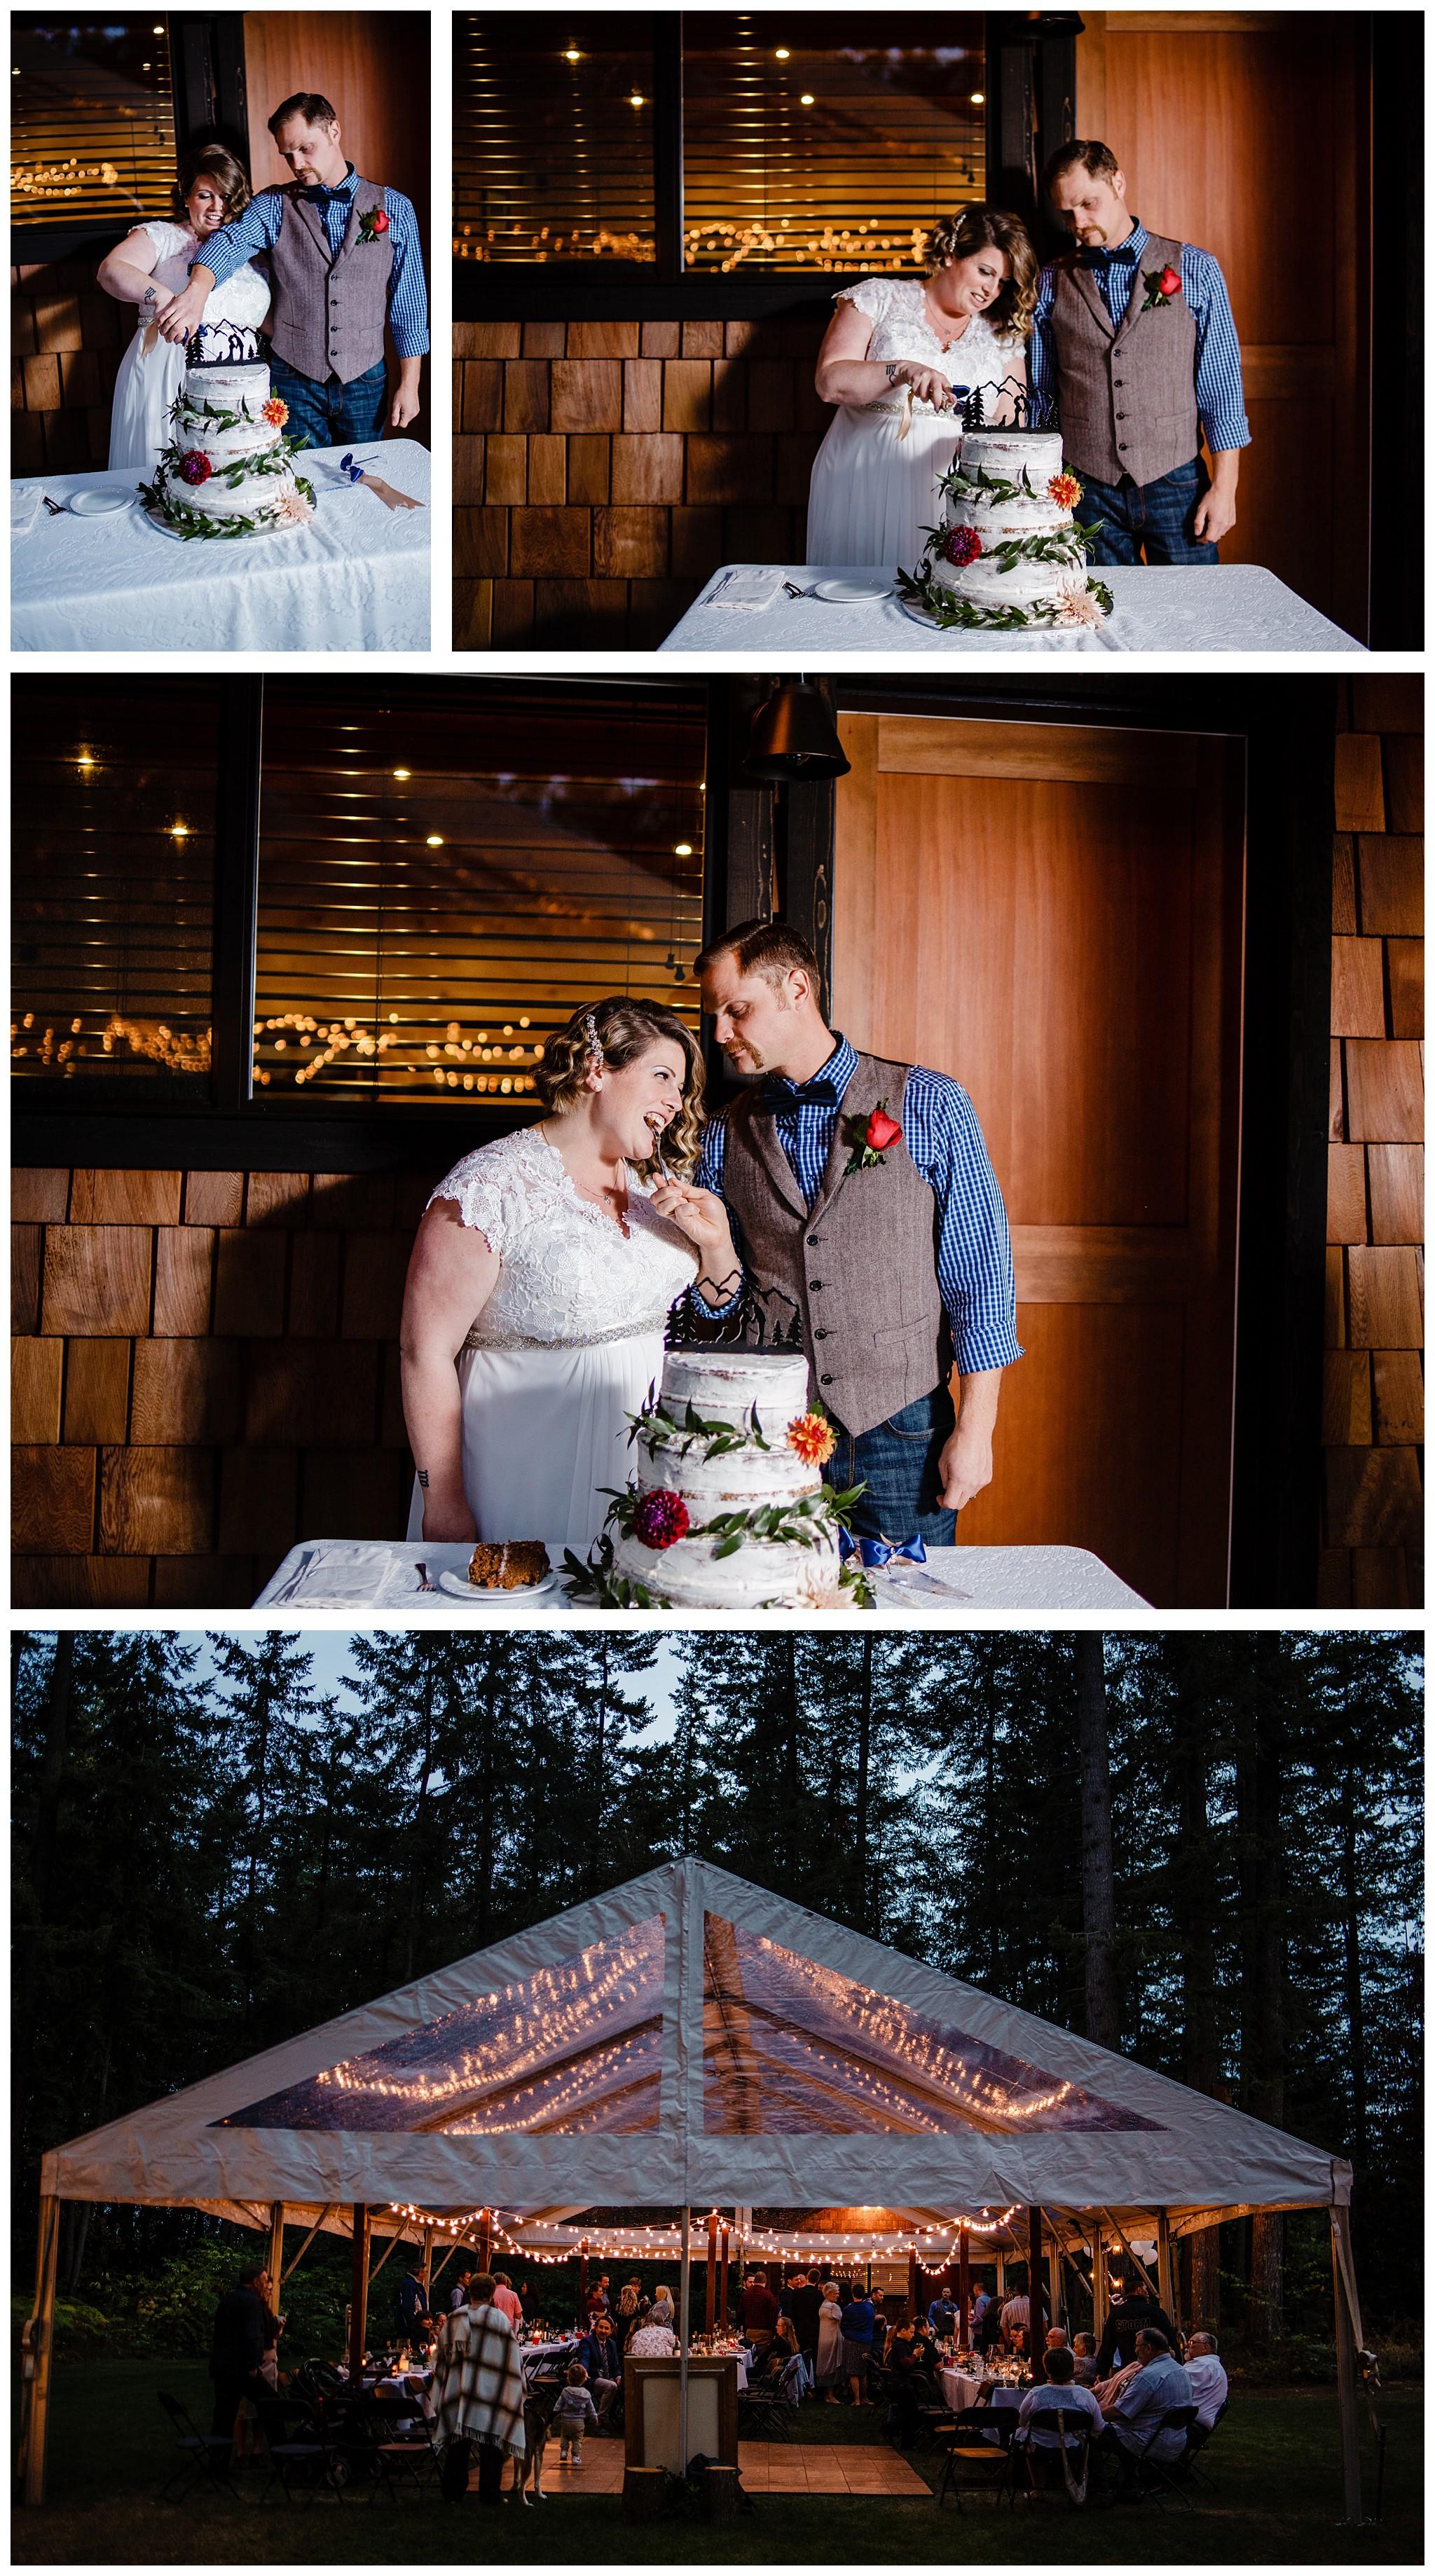 Aldergrove Park Fall Backyard Wedding Photographer Pregnant Bride Tent Outdoor BC Canada Best Wedding Photographer_0054.jpg